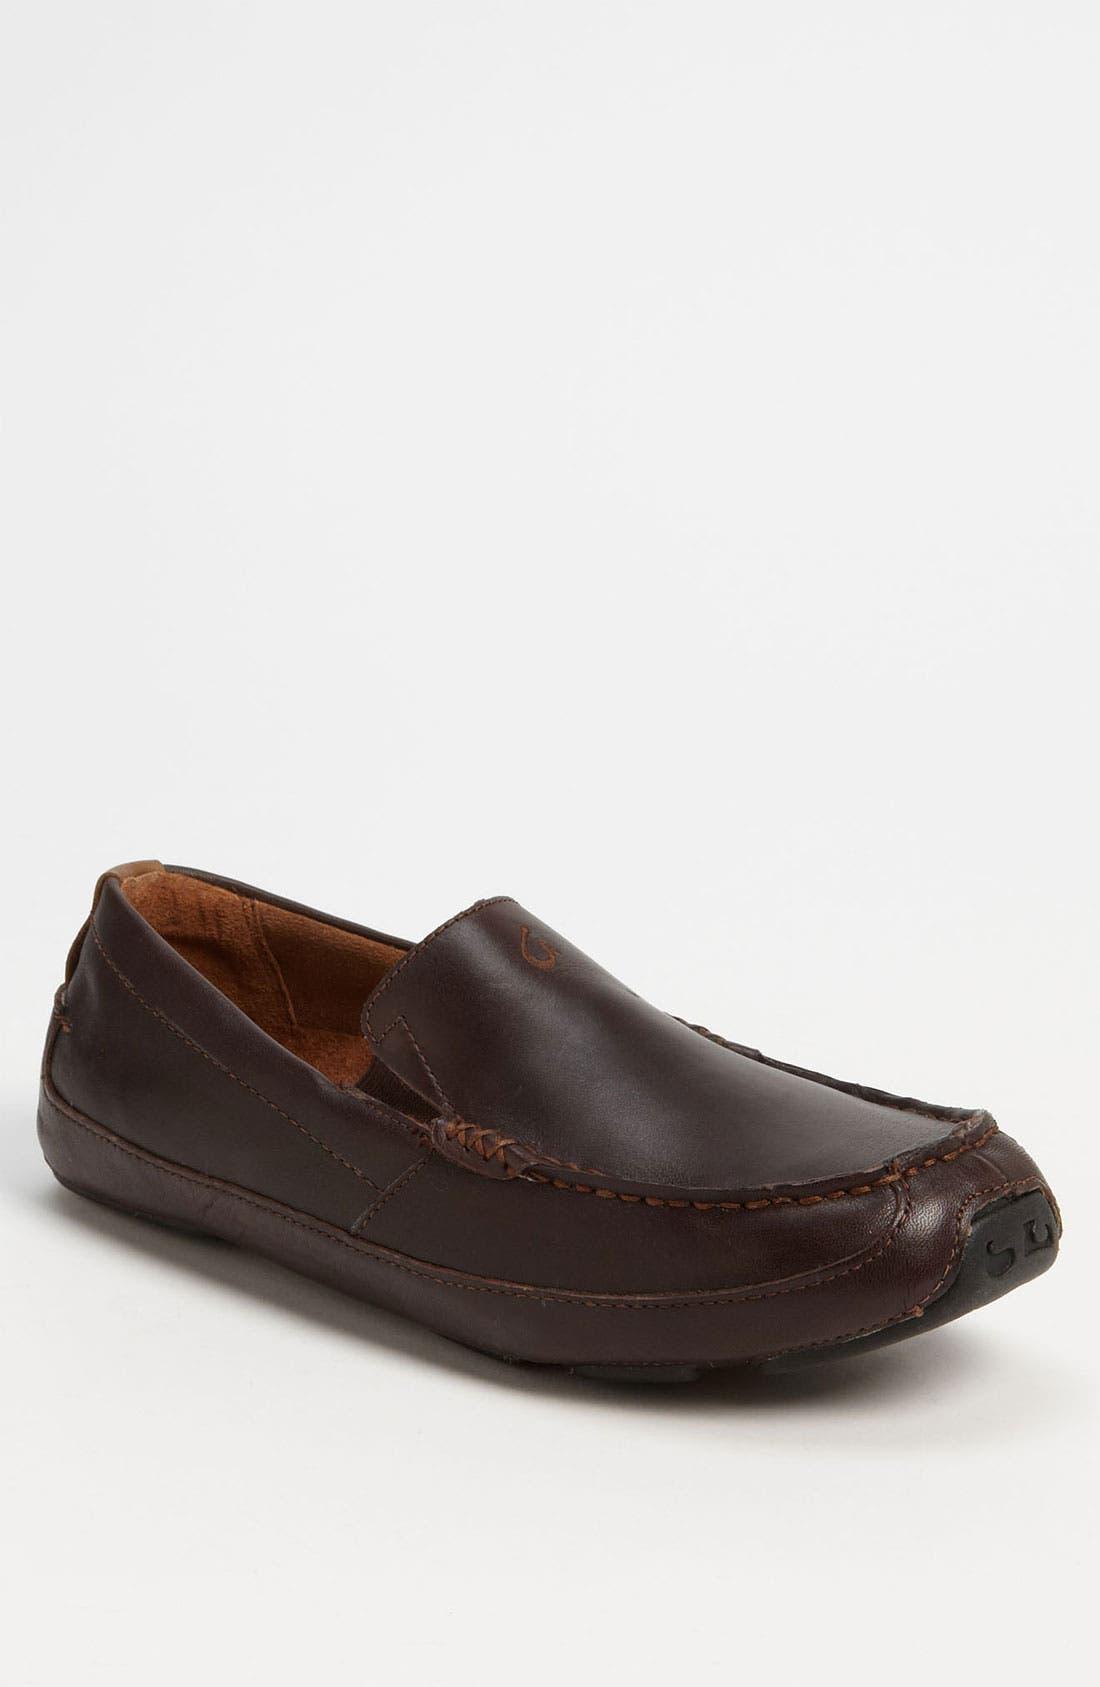 OluKai 'Akepa' Driving Shoe